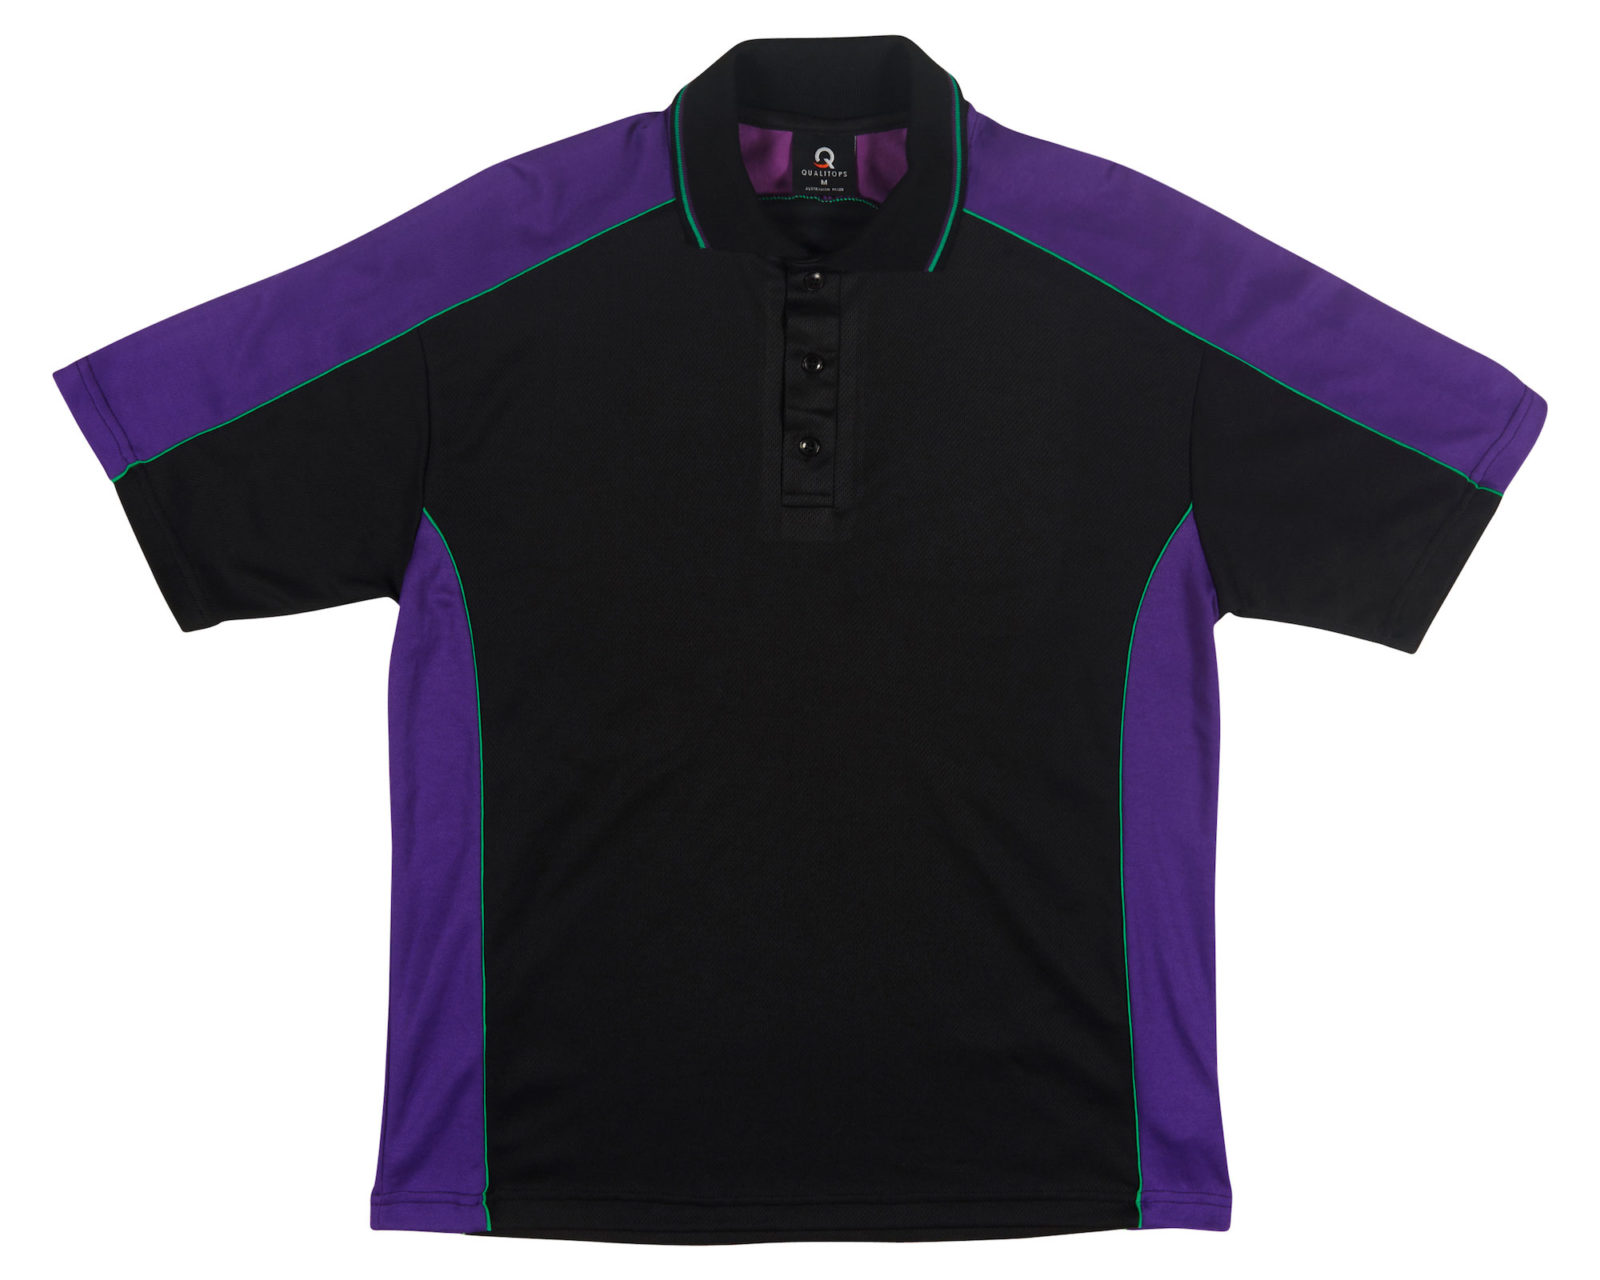 Mens two tone s s polo 524 australian made polo shirt for Custom tailored polo shirts